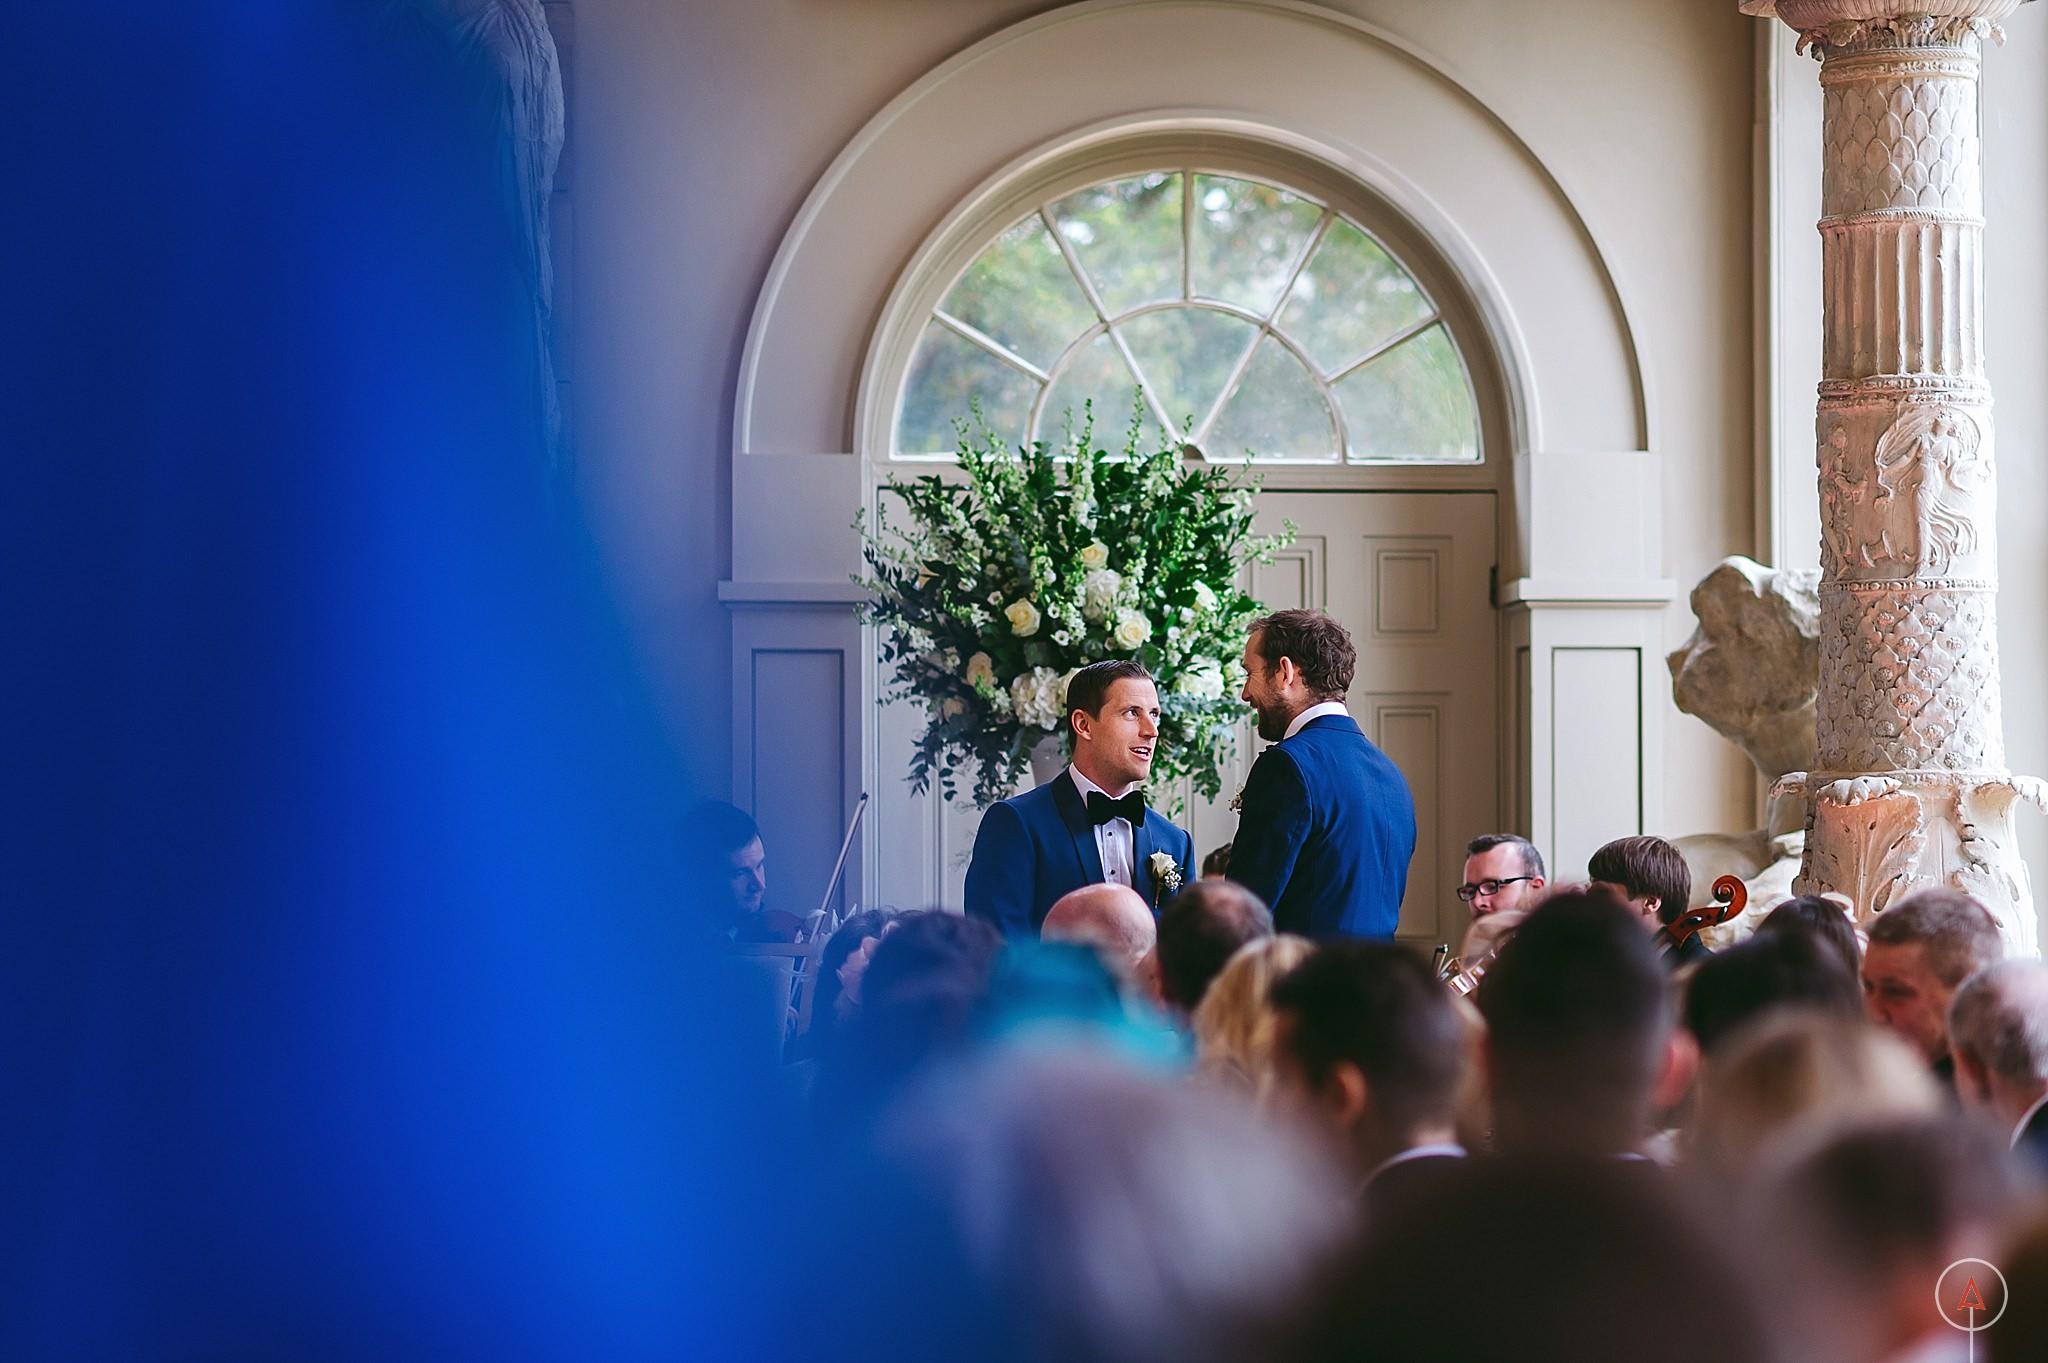 cardiff-wedding-photographer-aga-tomaszek_0242